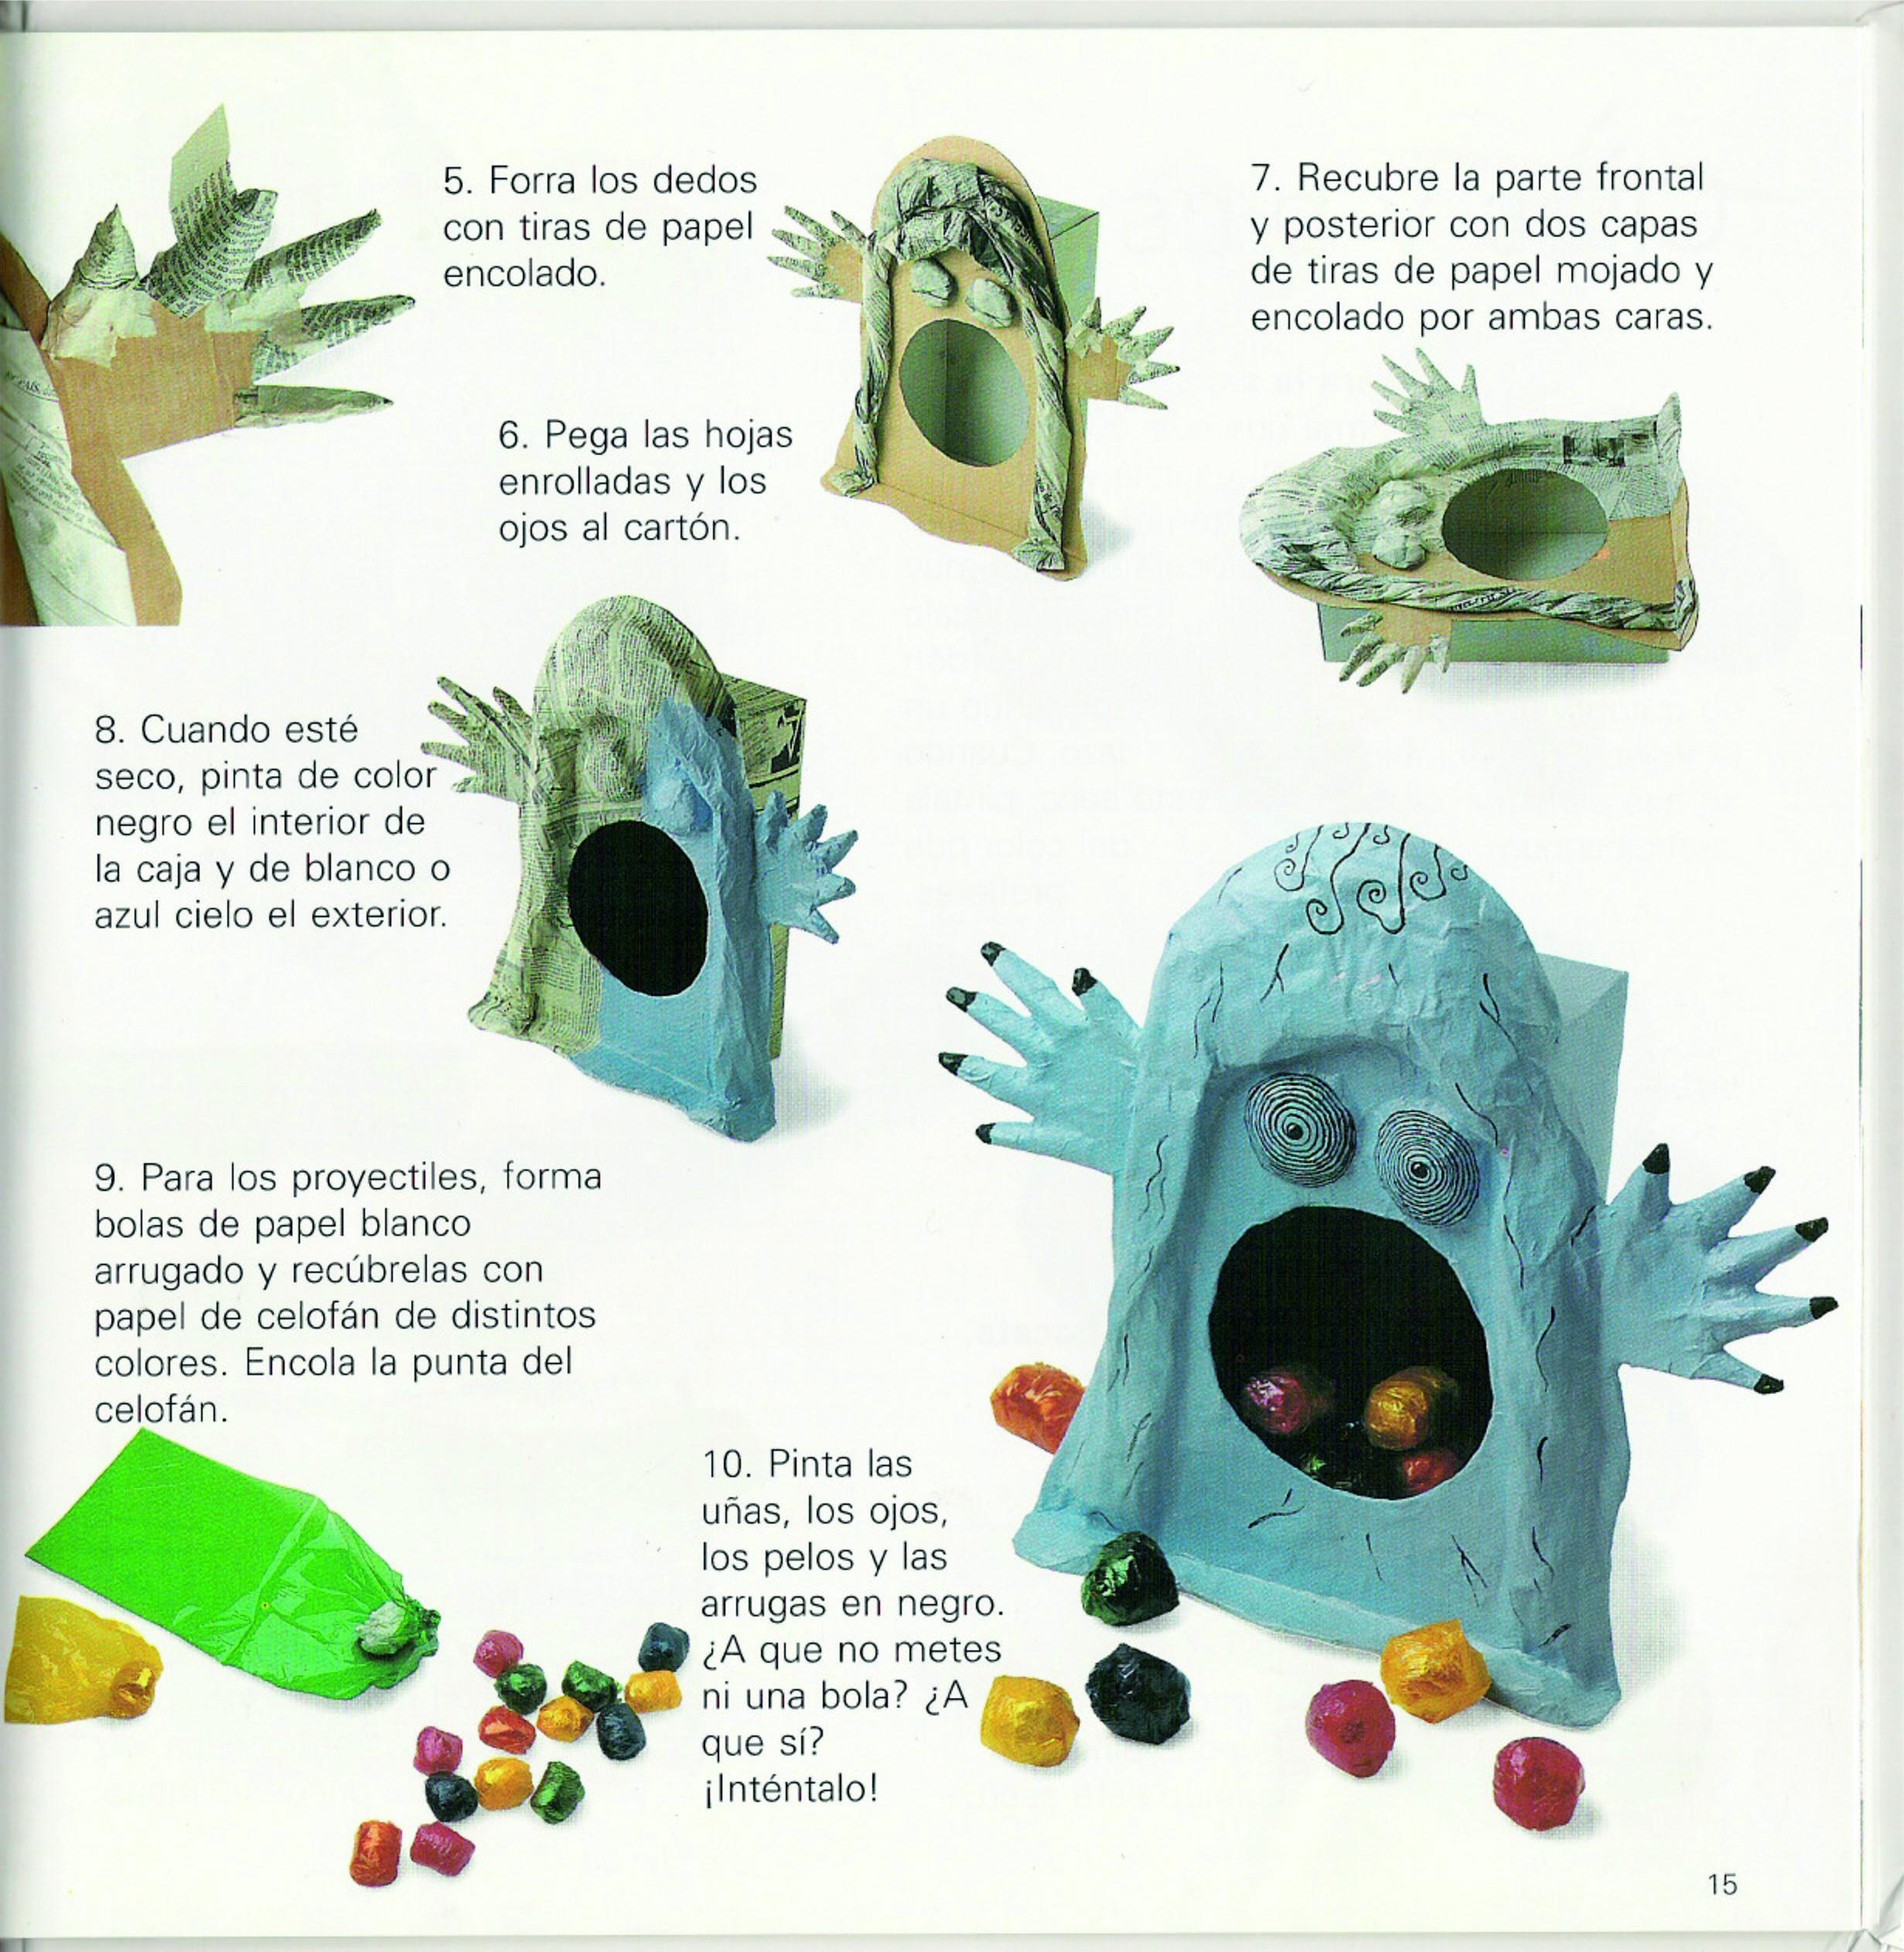 Manualidades con papel mach serpientes fantasmas - Manualidades de madera paso a paso ...